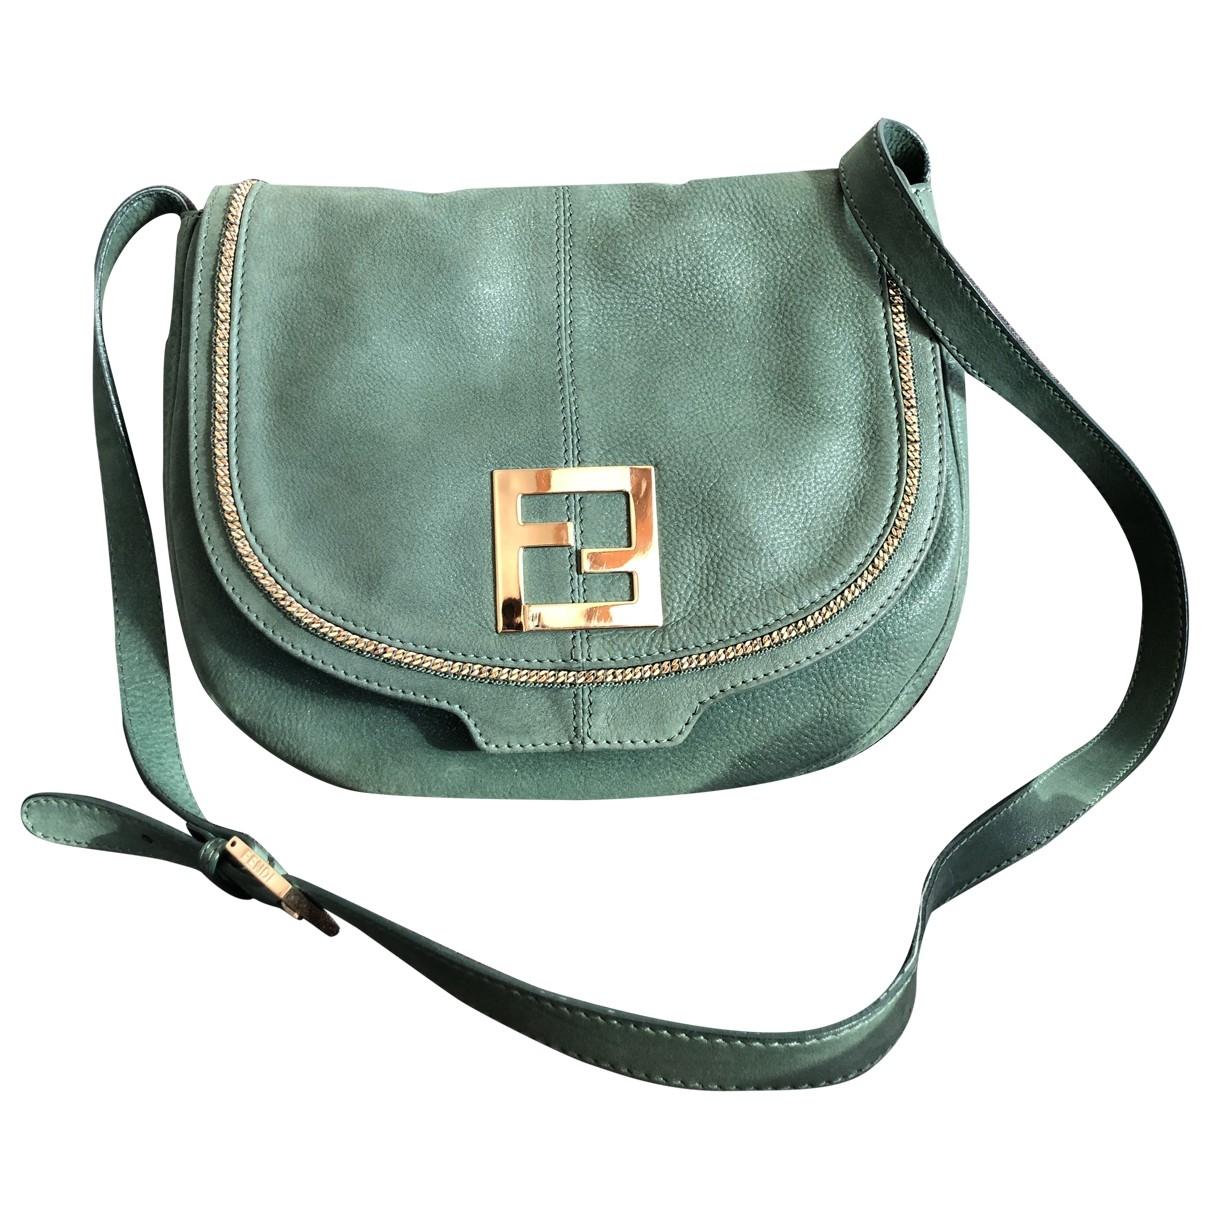 Fendi \N Handtasche in  Gruen Leder